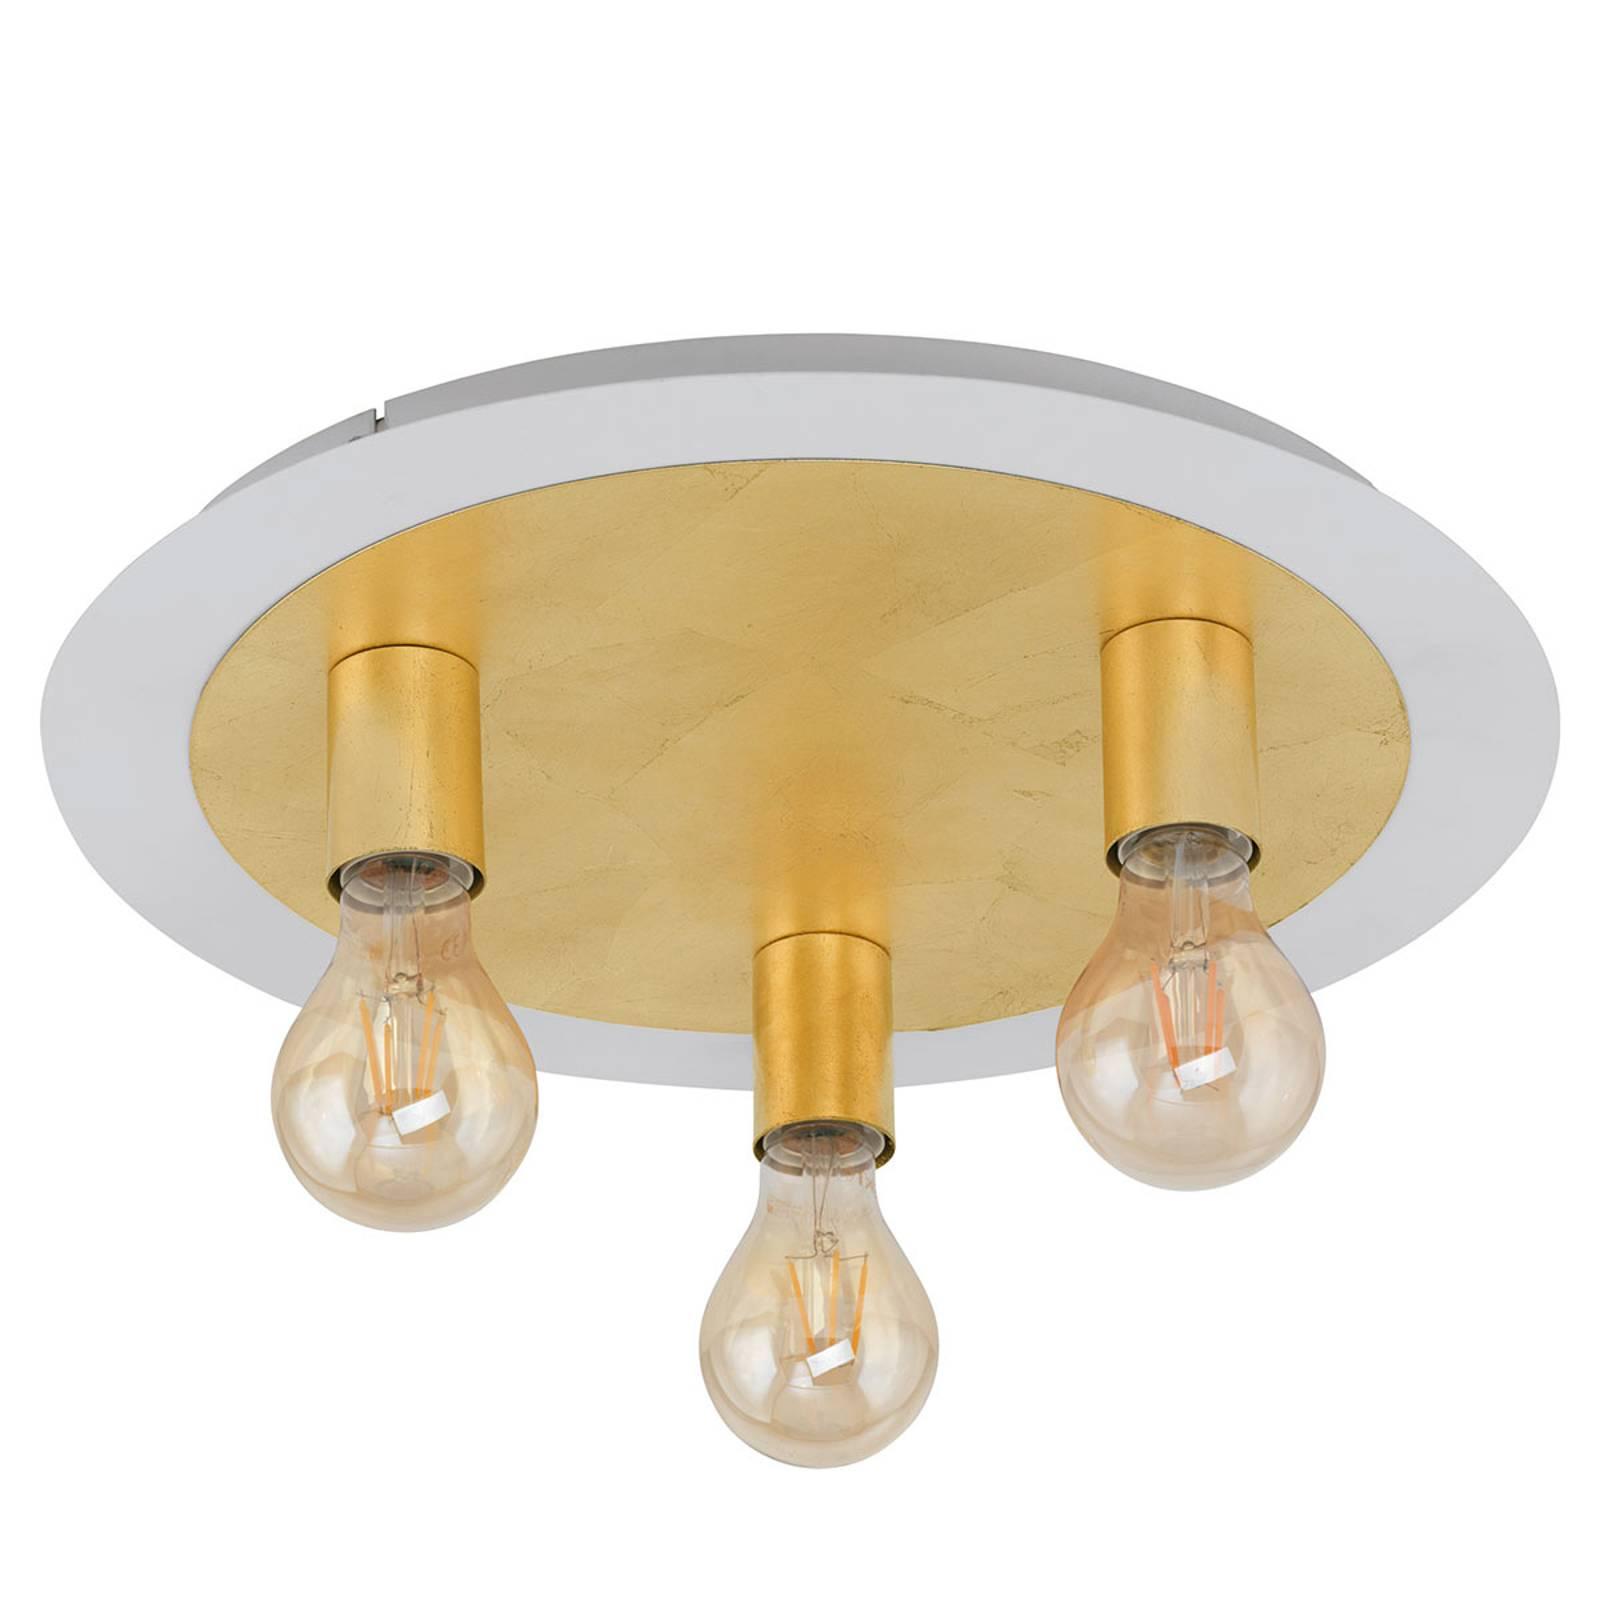 LED plafondlamp Passano 3-lamps goud